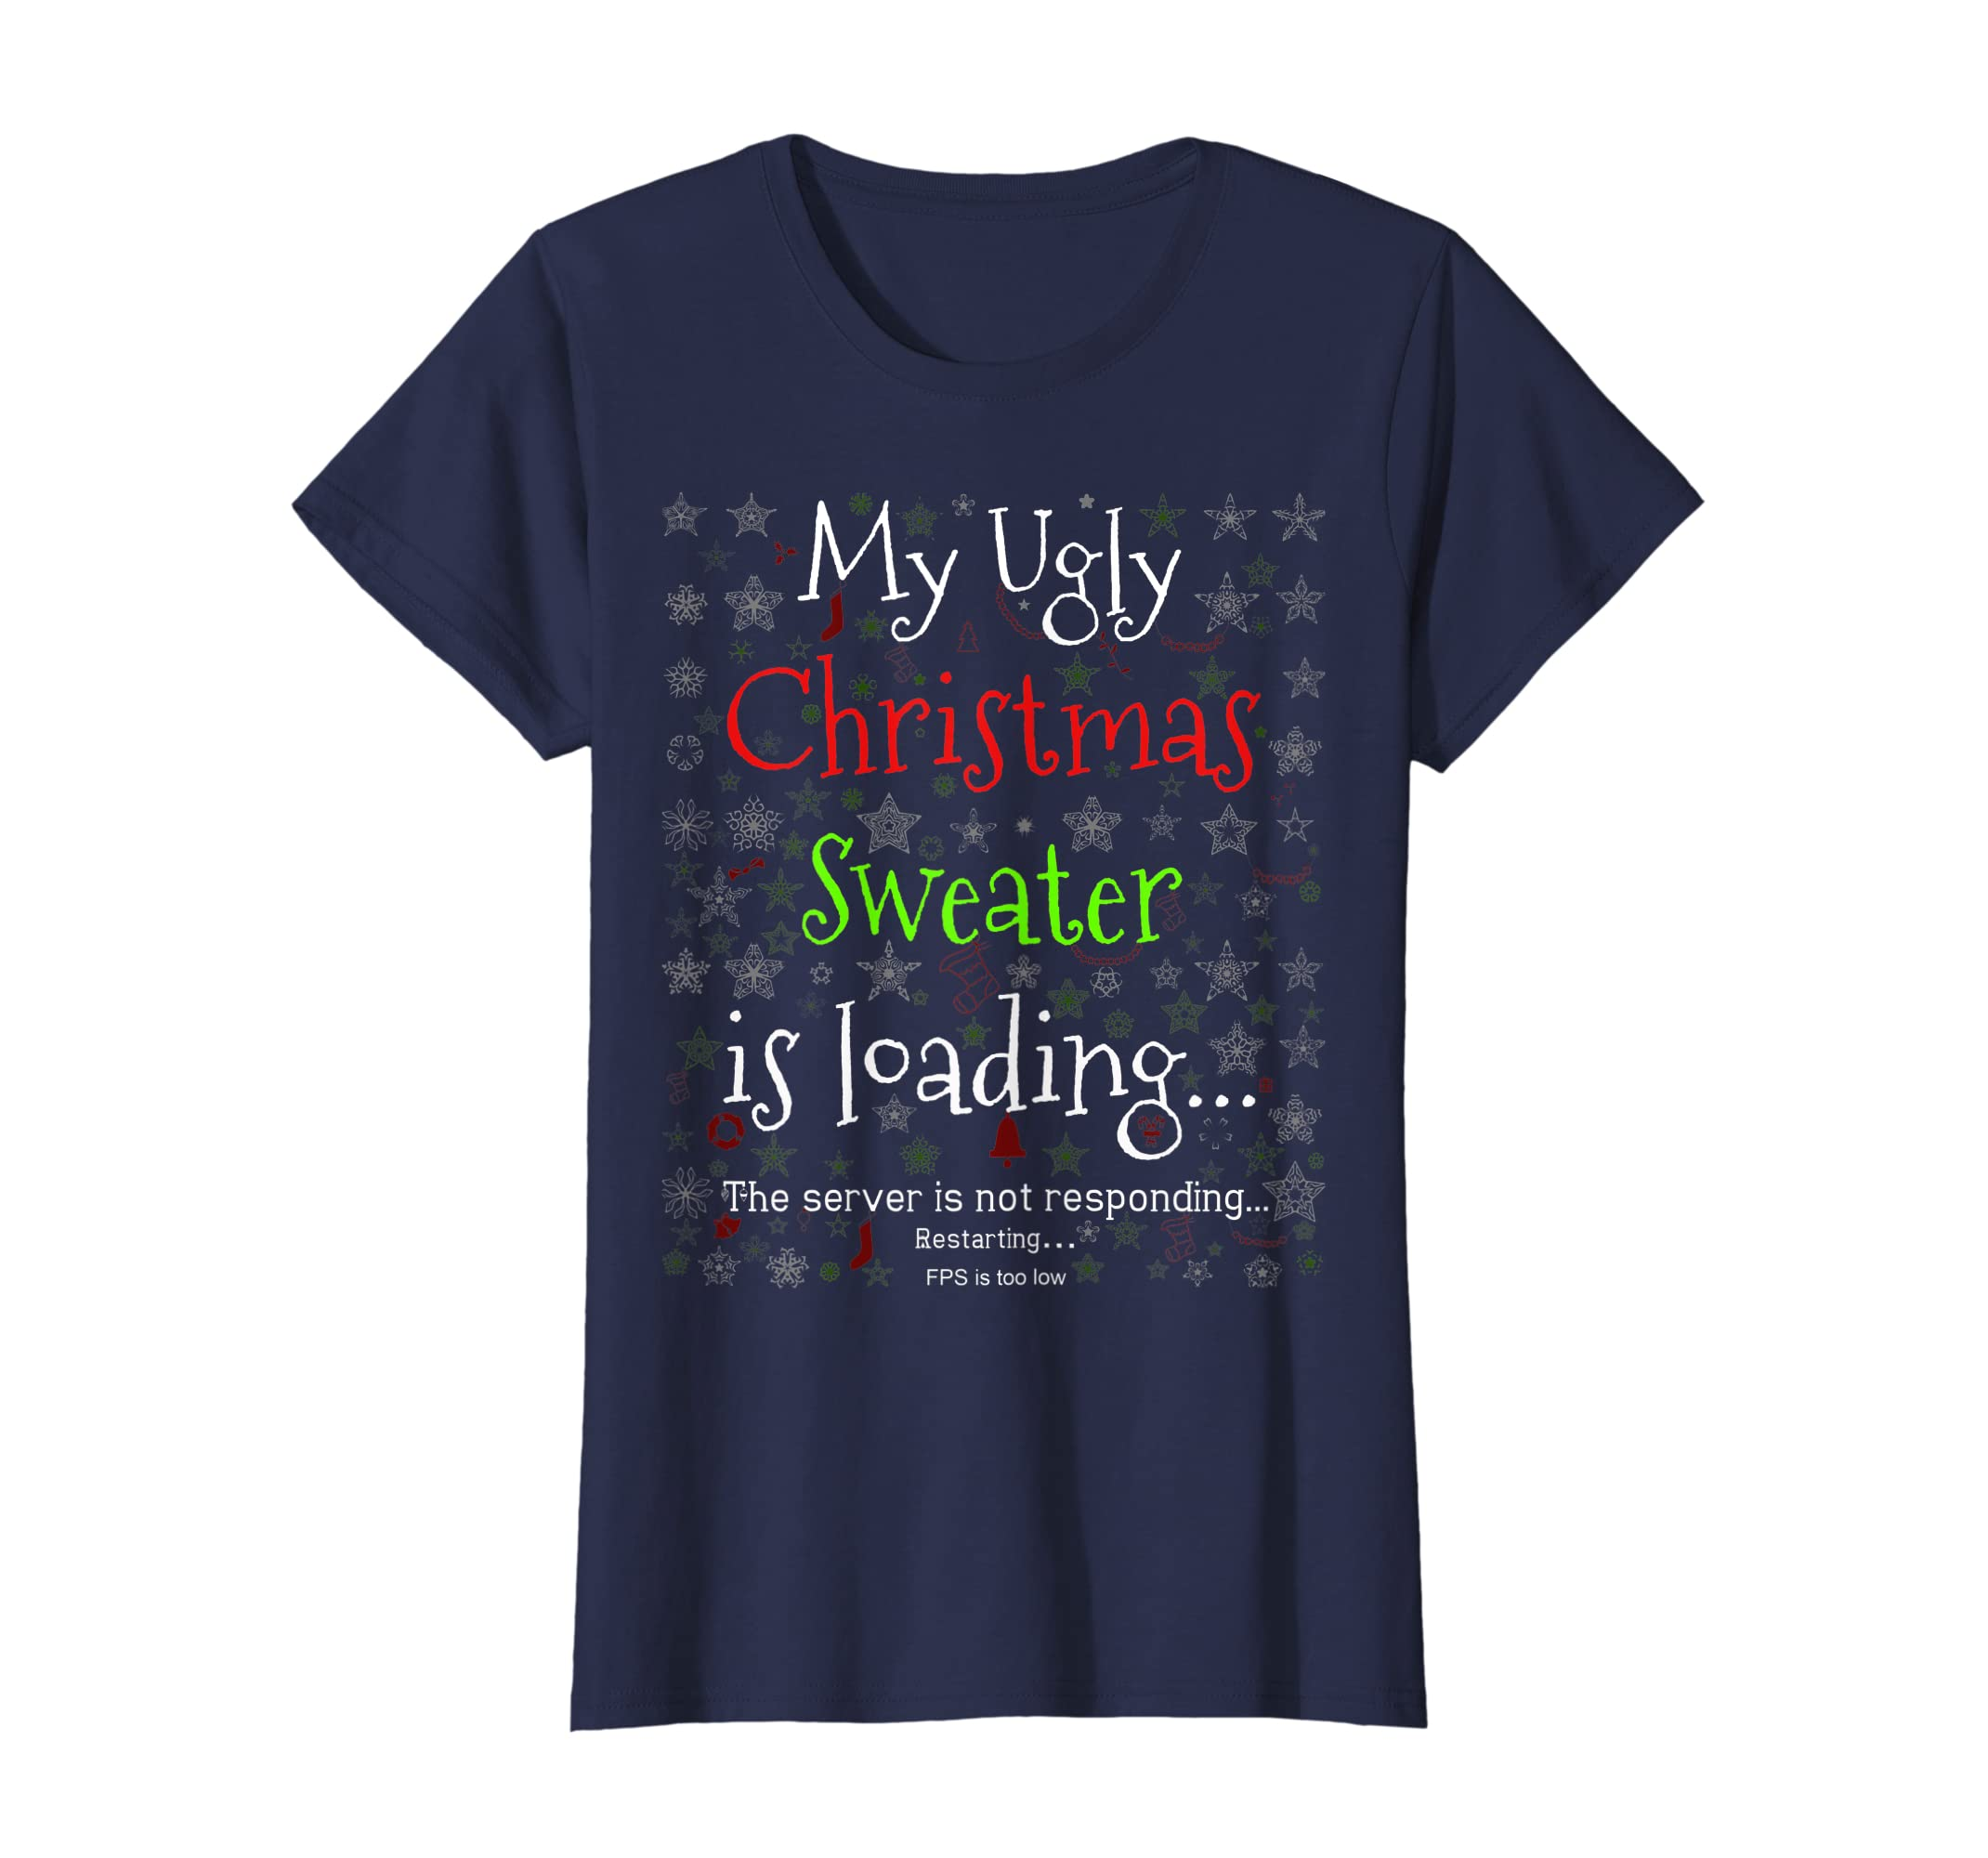 d03ba01e Amazon.com: My Ugly Christmas Sweater Loading Tee Funny Christmas Shirt:  Clothing